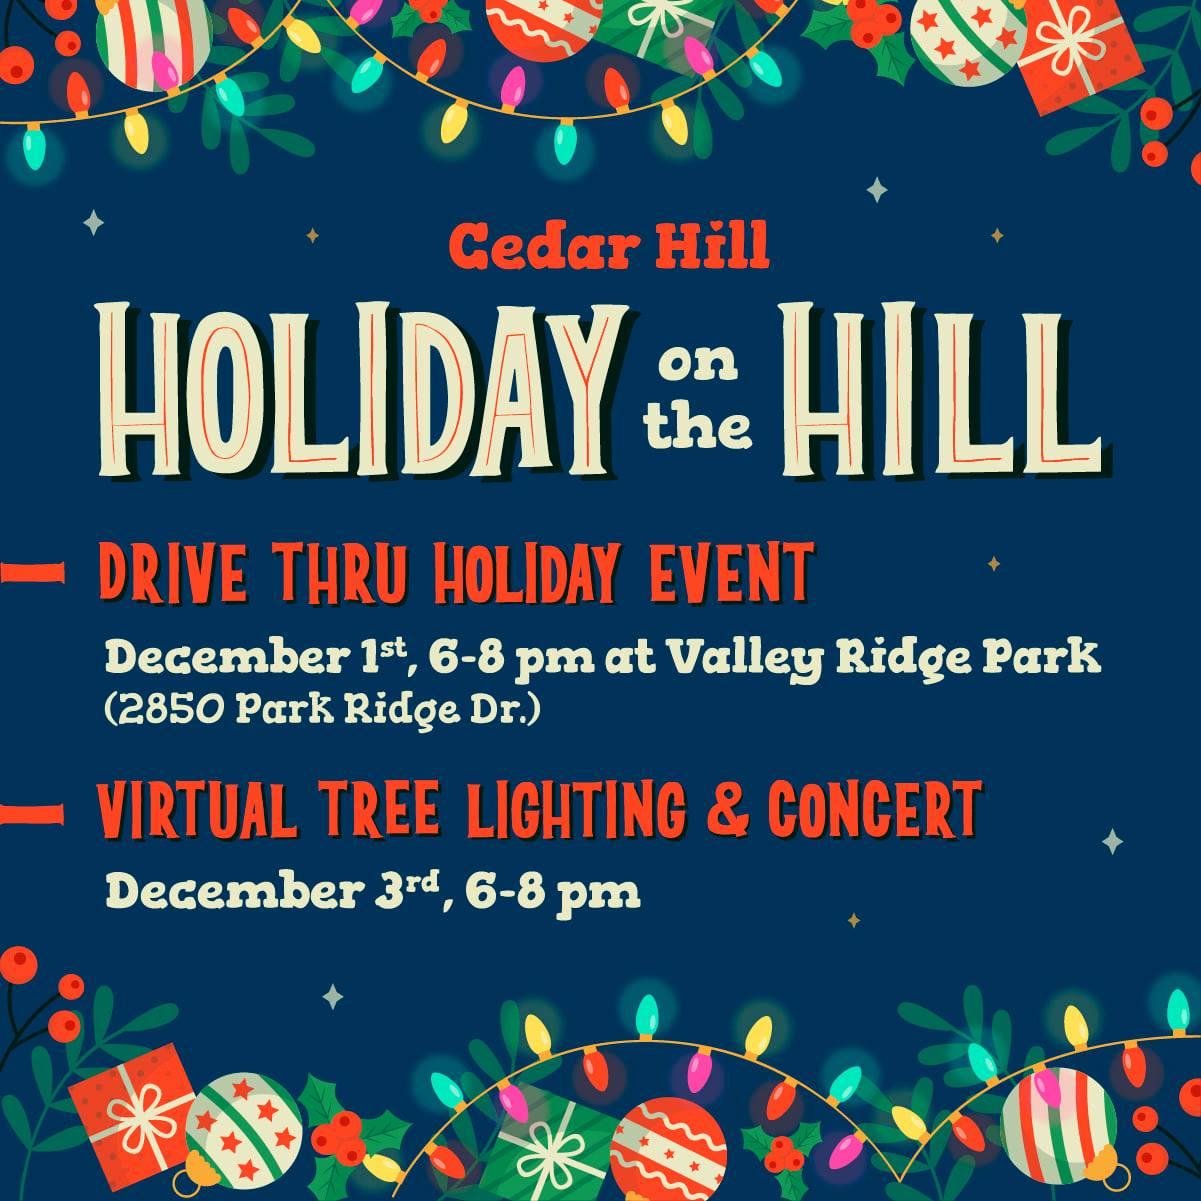 Cedar Hill Holiday on the Hill flyer